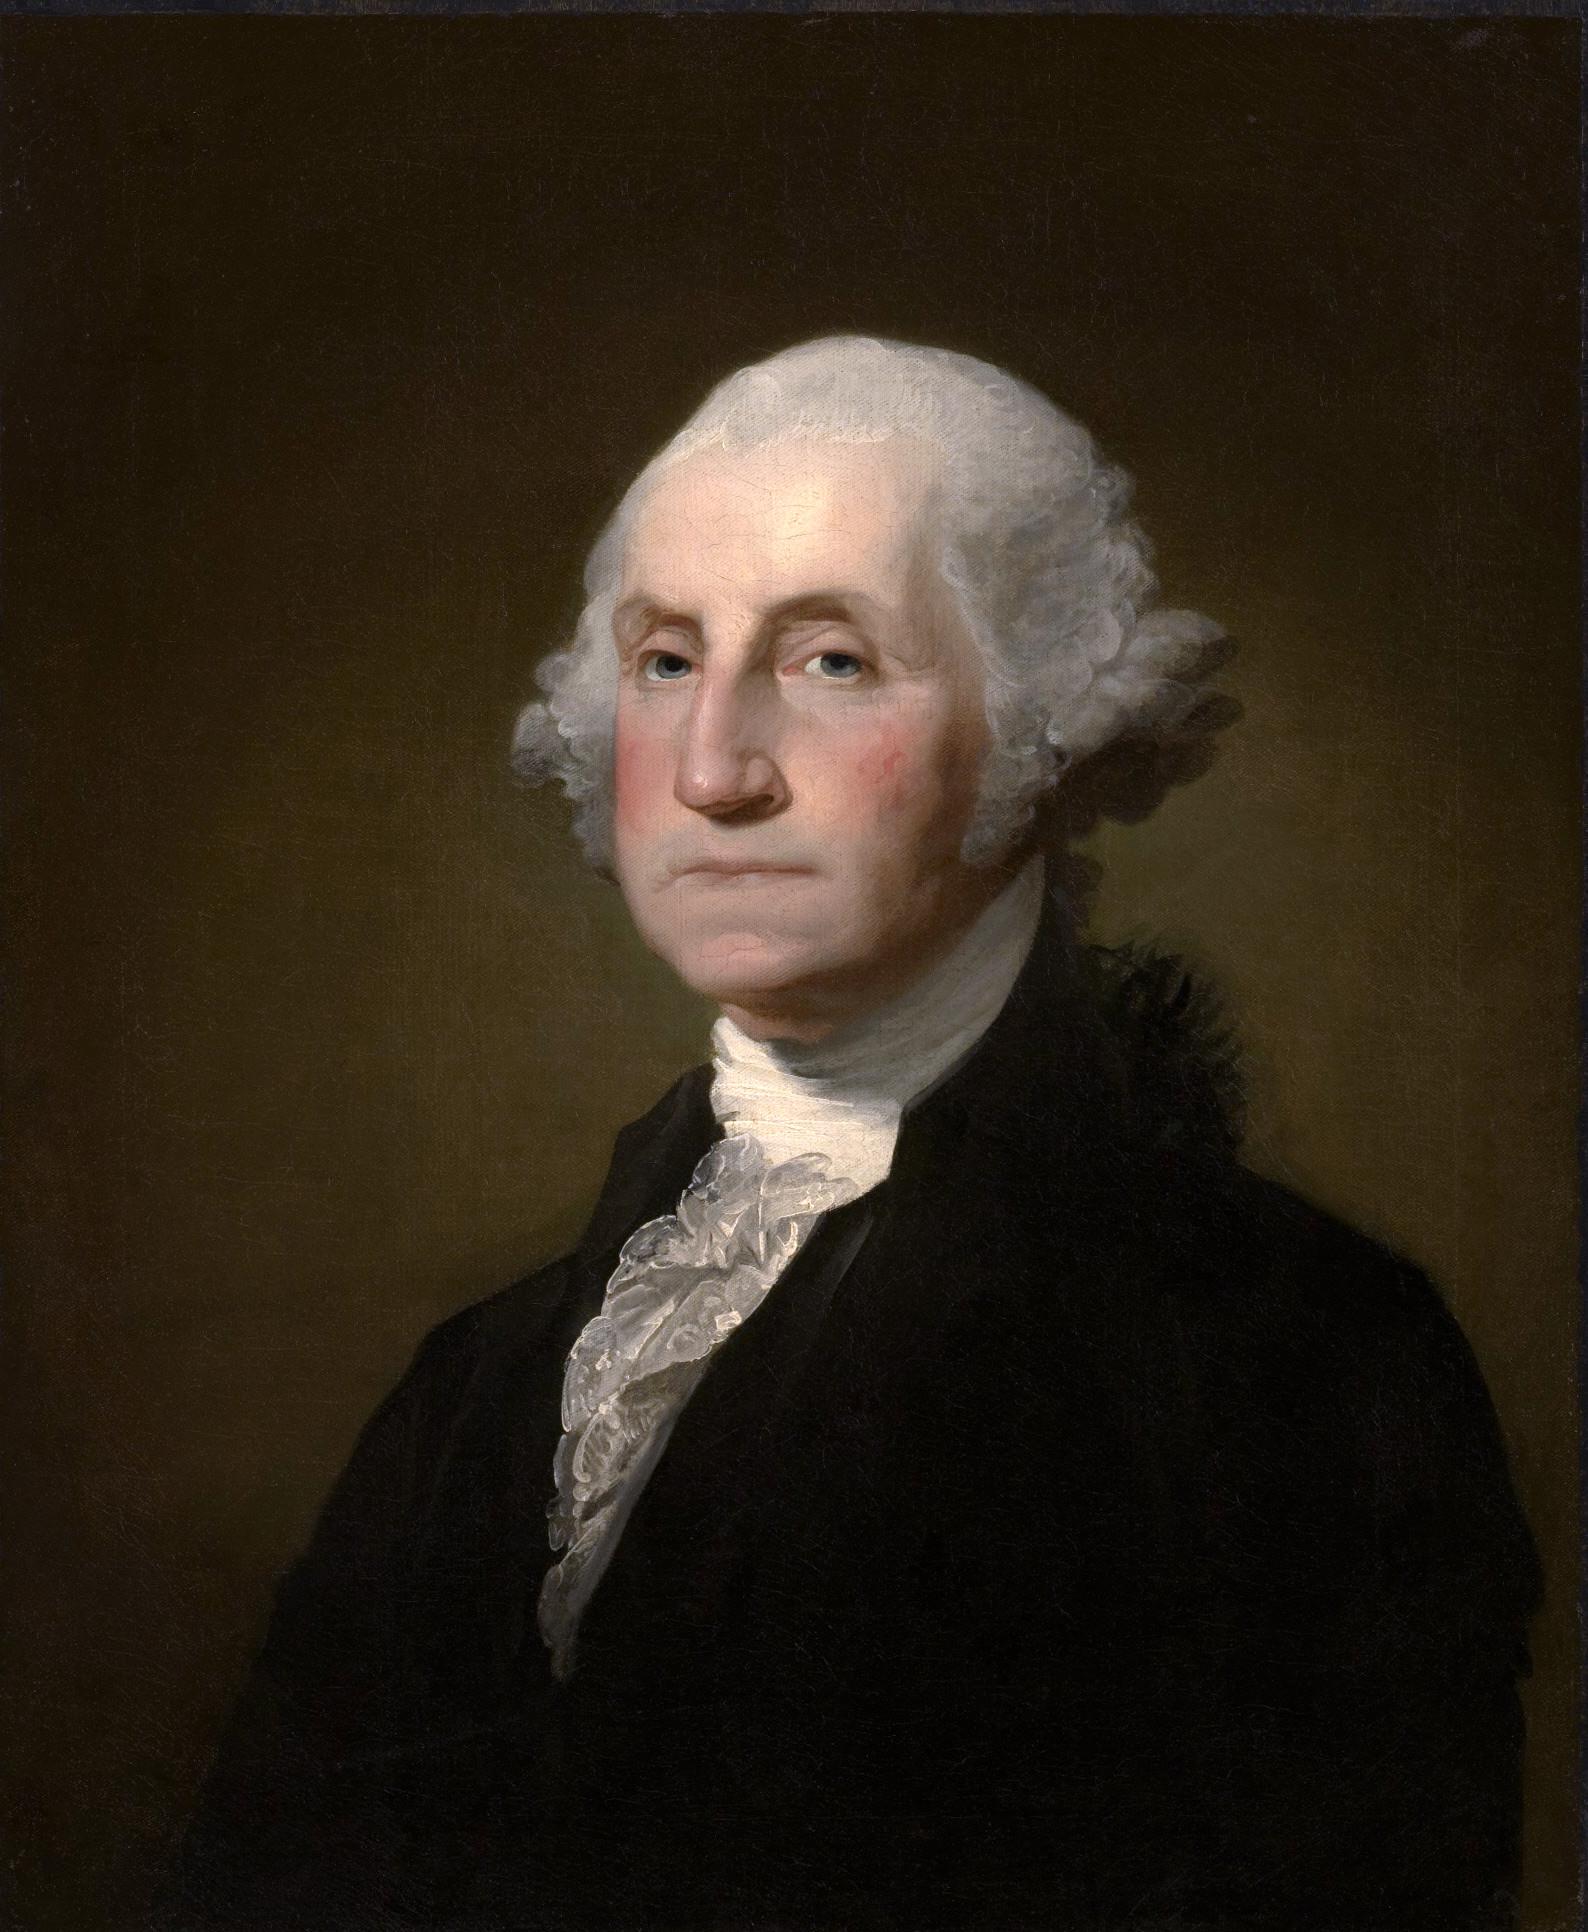 2) George Washington